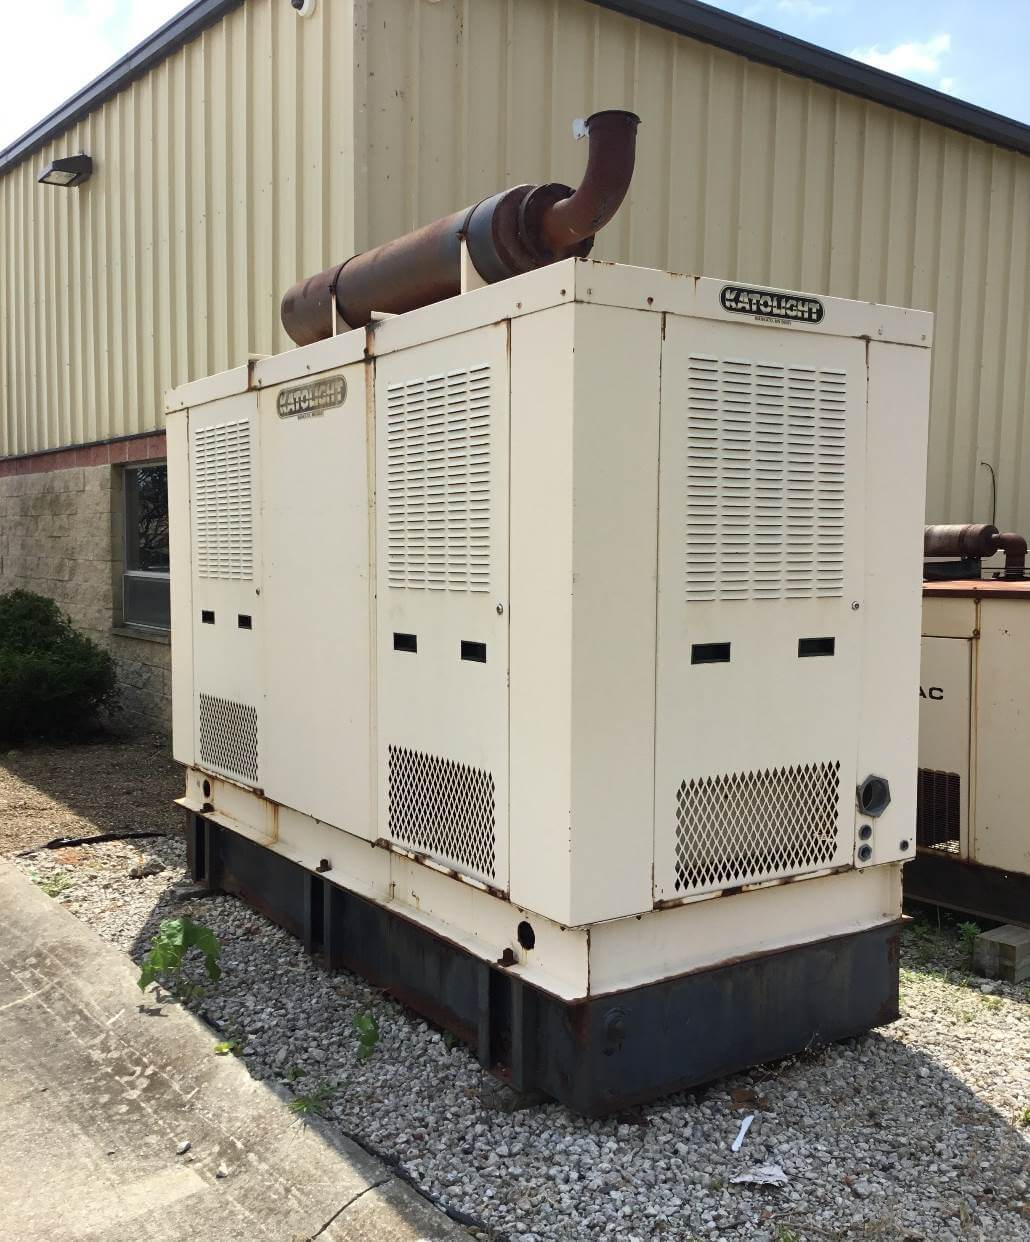 outdoor-generator-for-emergency-power